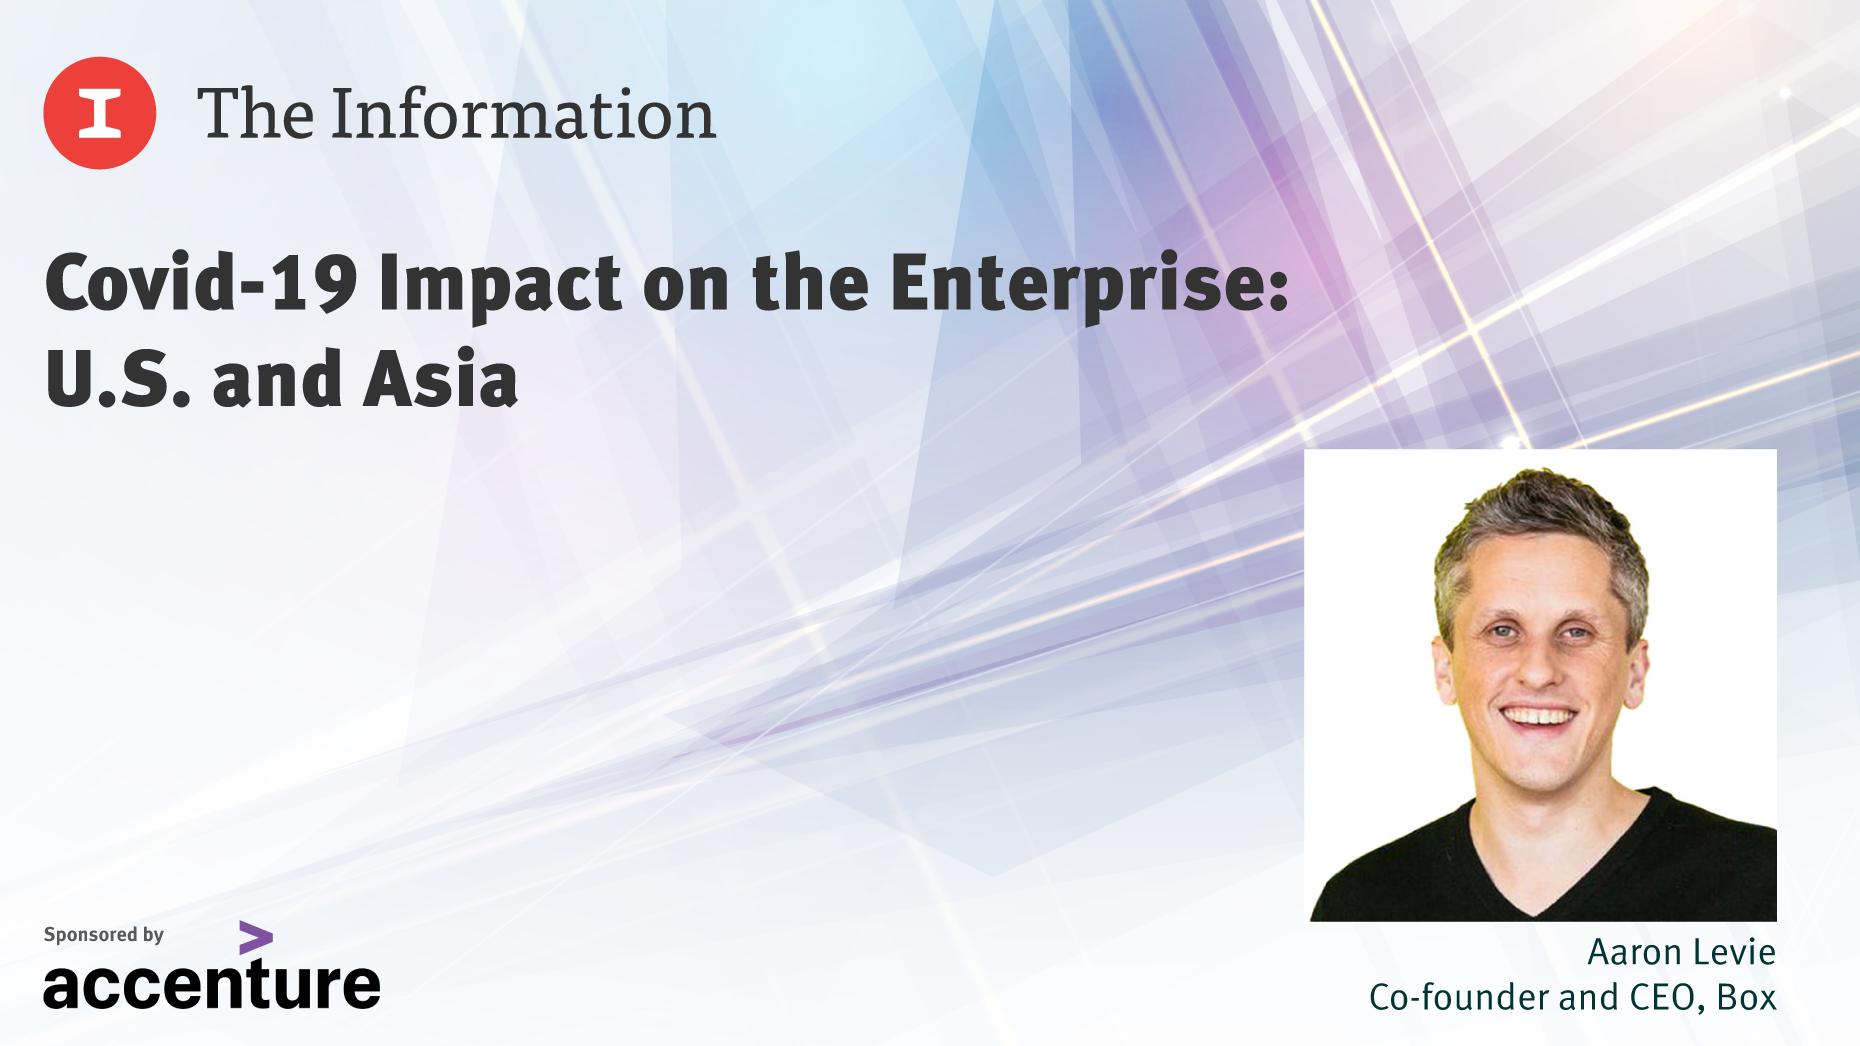 Covid-19 Impact on the Enterprise: U.S. and Asia